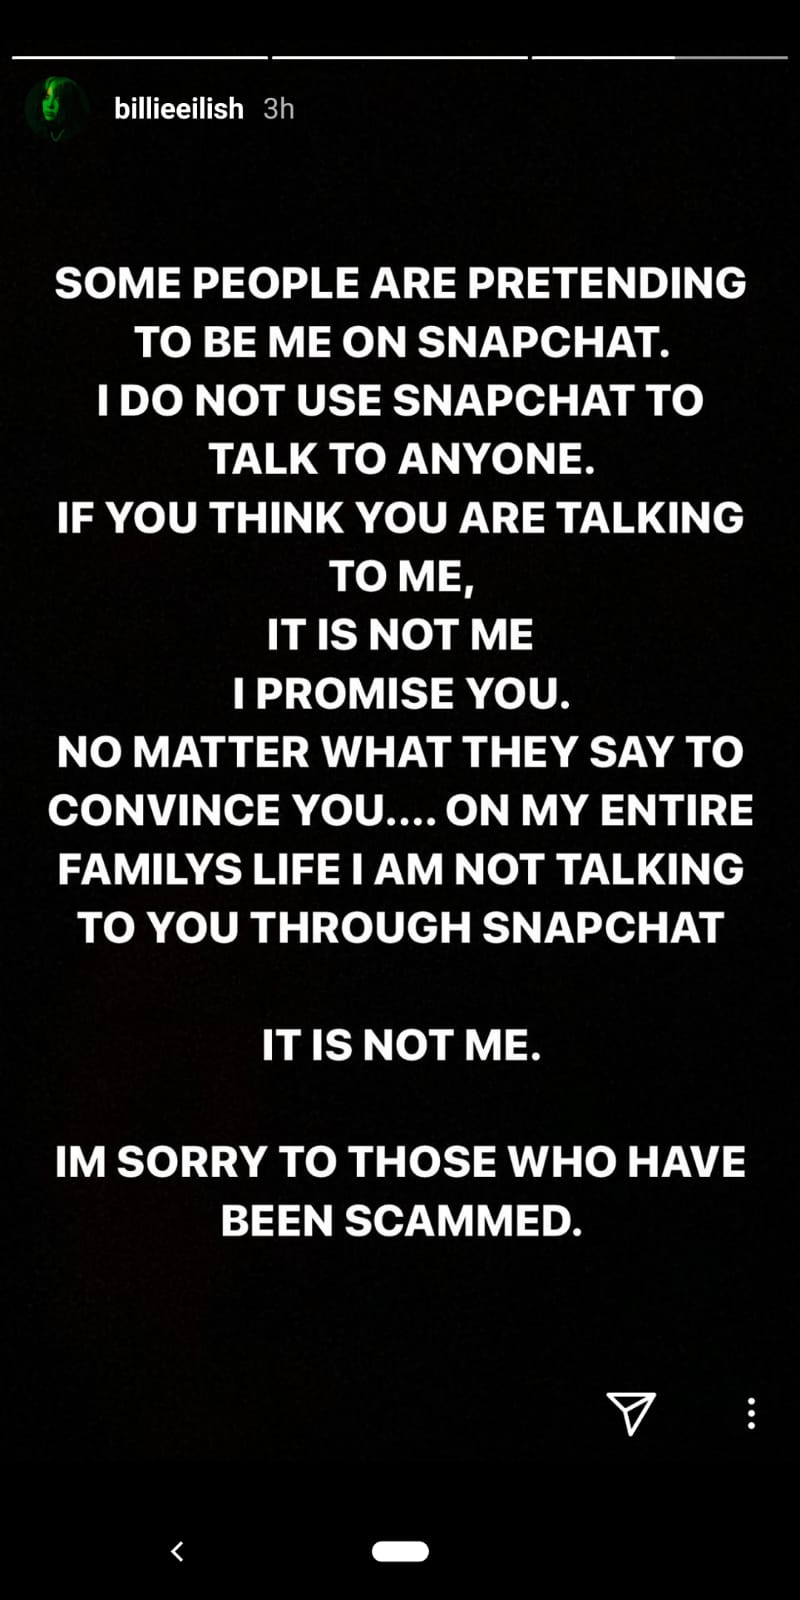 Billie Eilish Instagram story - 30 March 2020